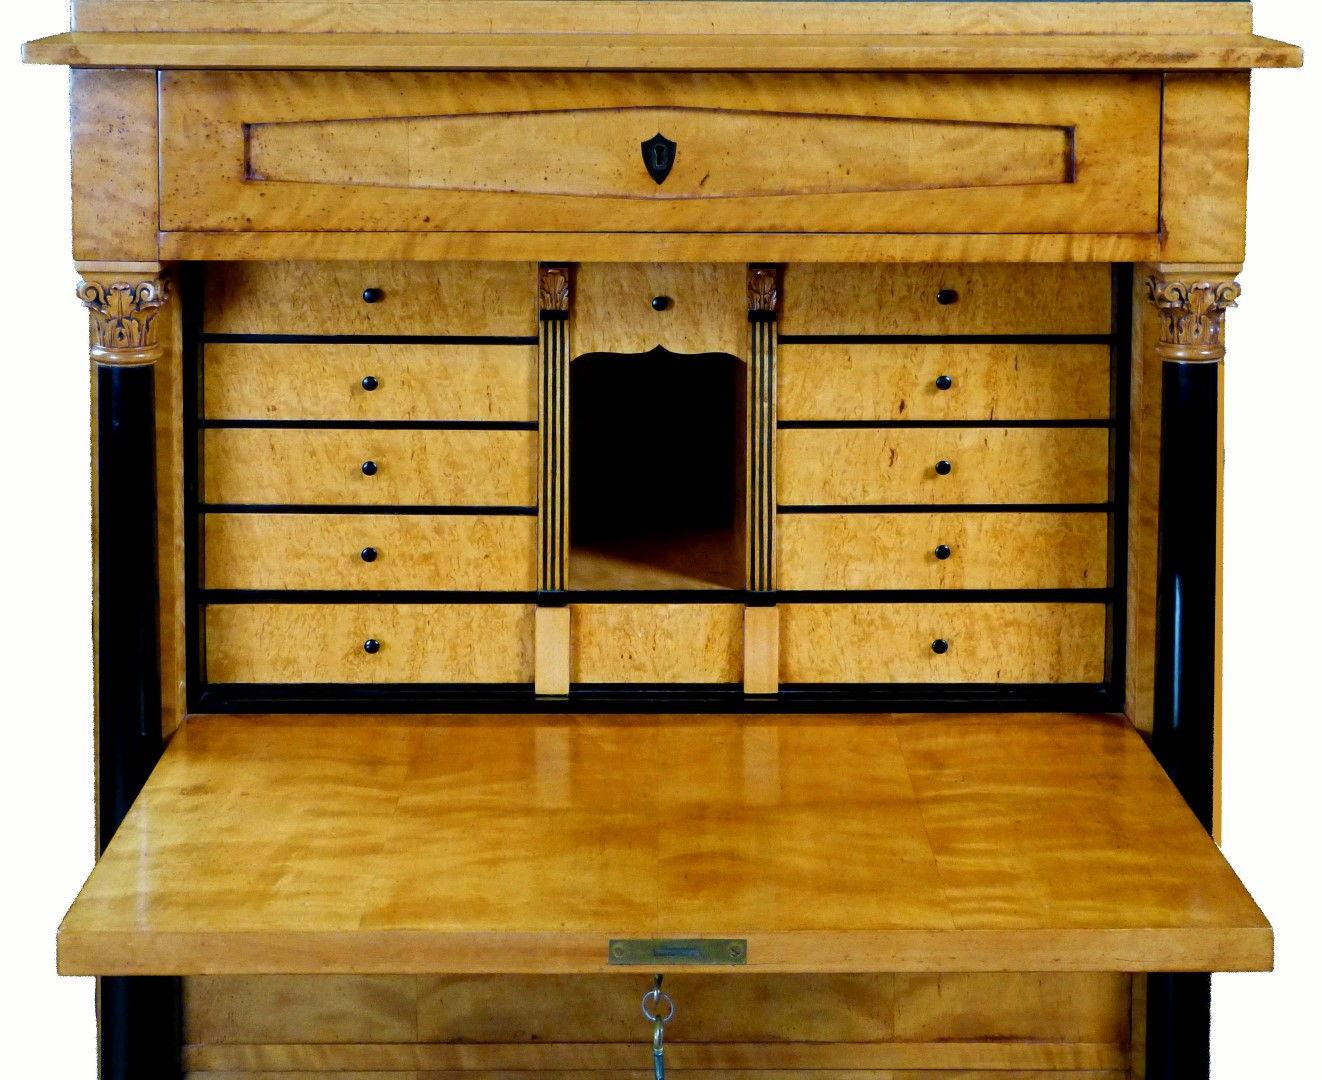 Muebles Antiguos Armarios Antiguos Mesas Antiguas C Modas  # Muebles Secreter